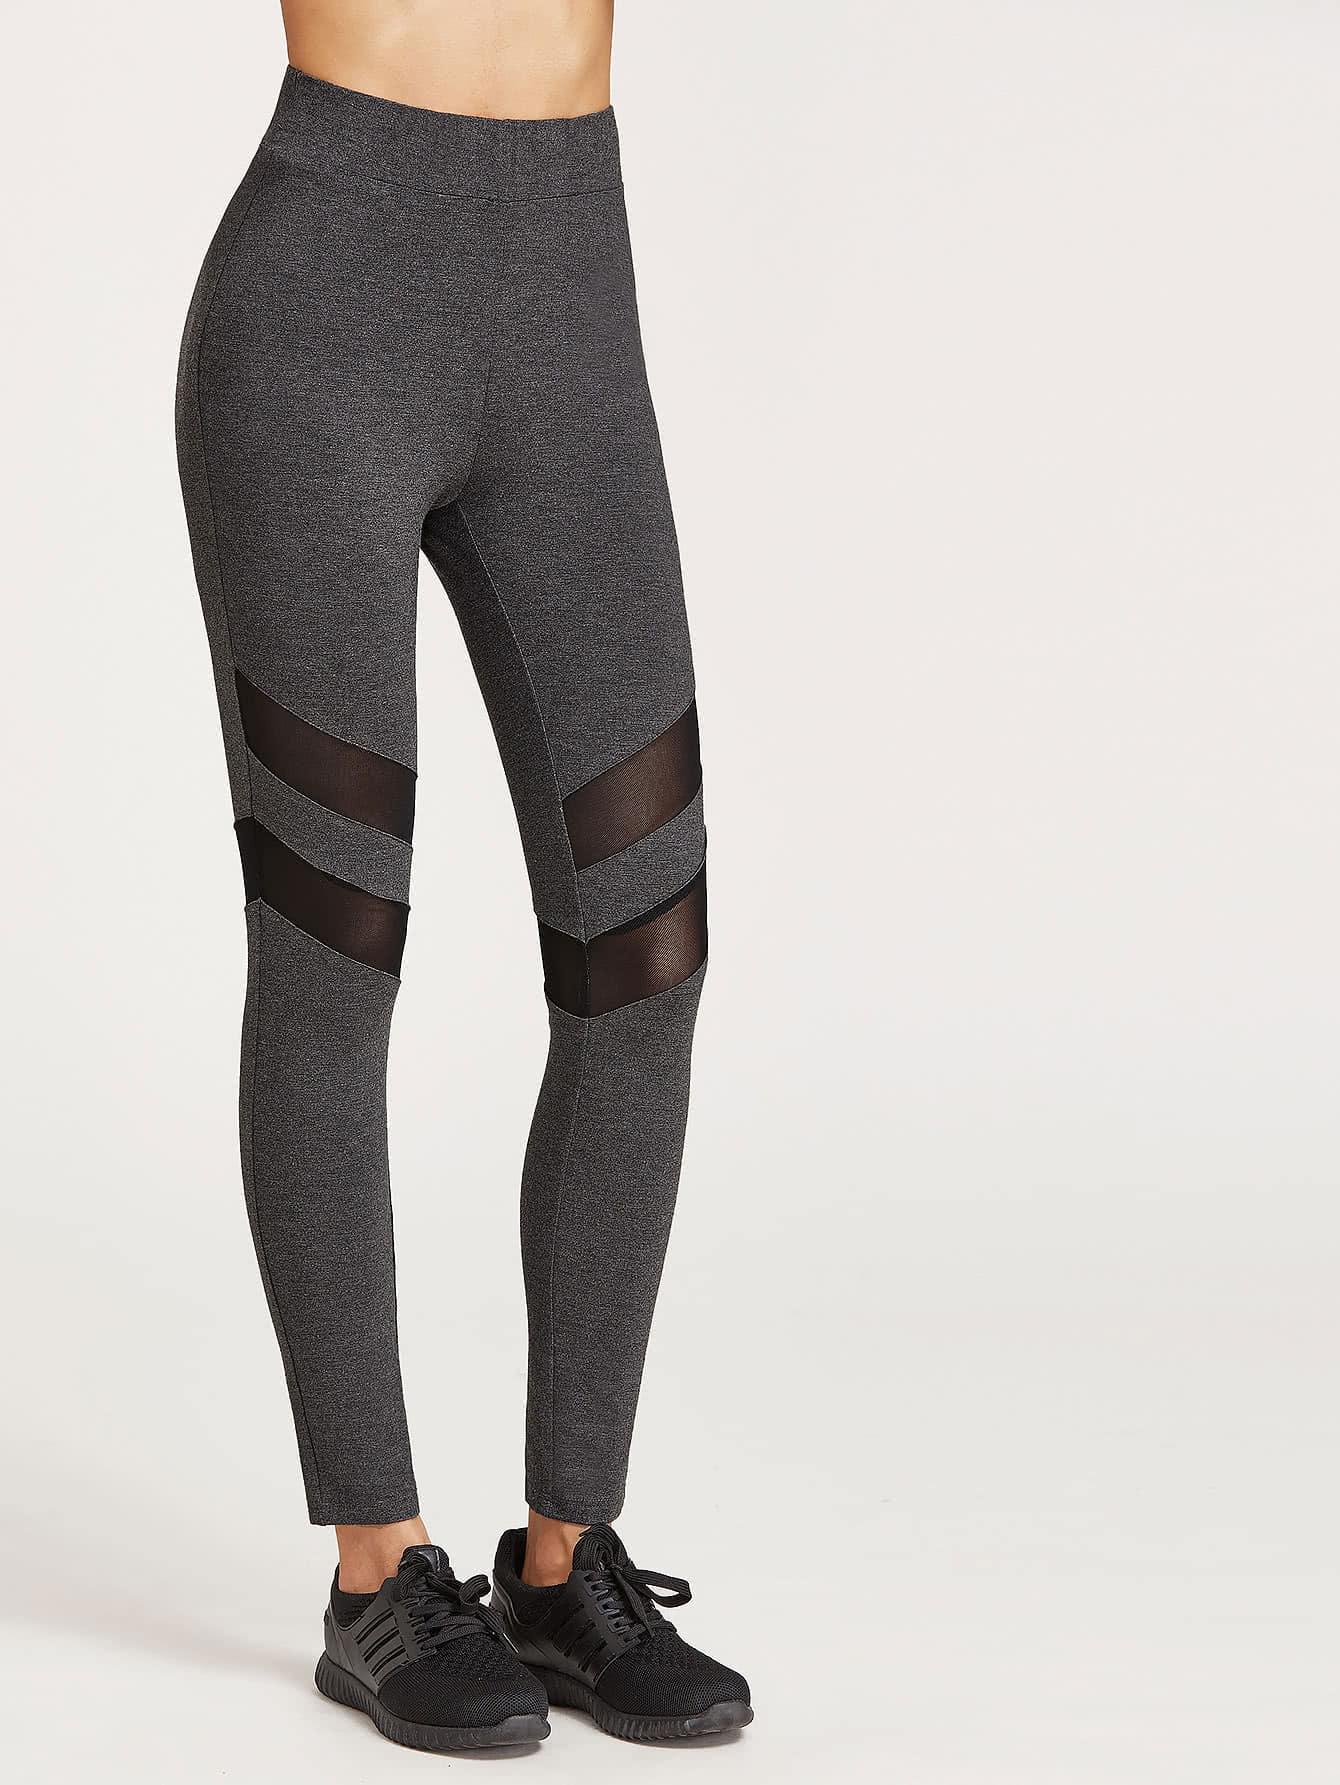 Heather Grey High Waist Leggings With Mesh Panel Detail leggings161228704